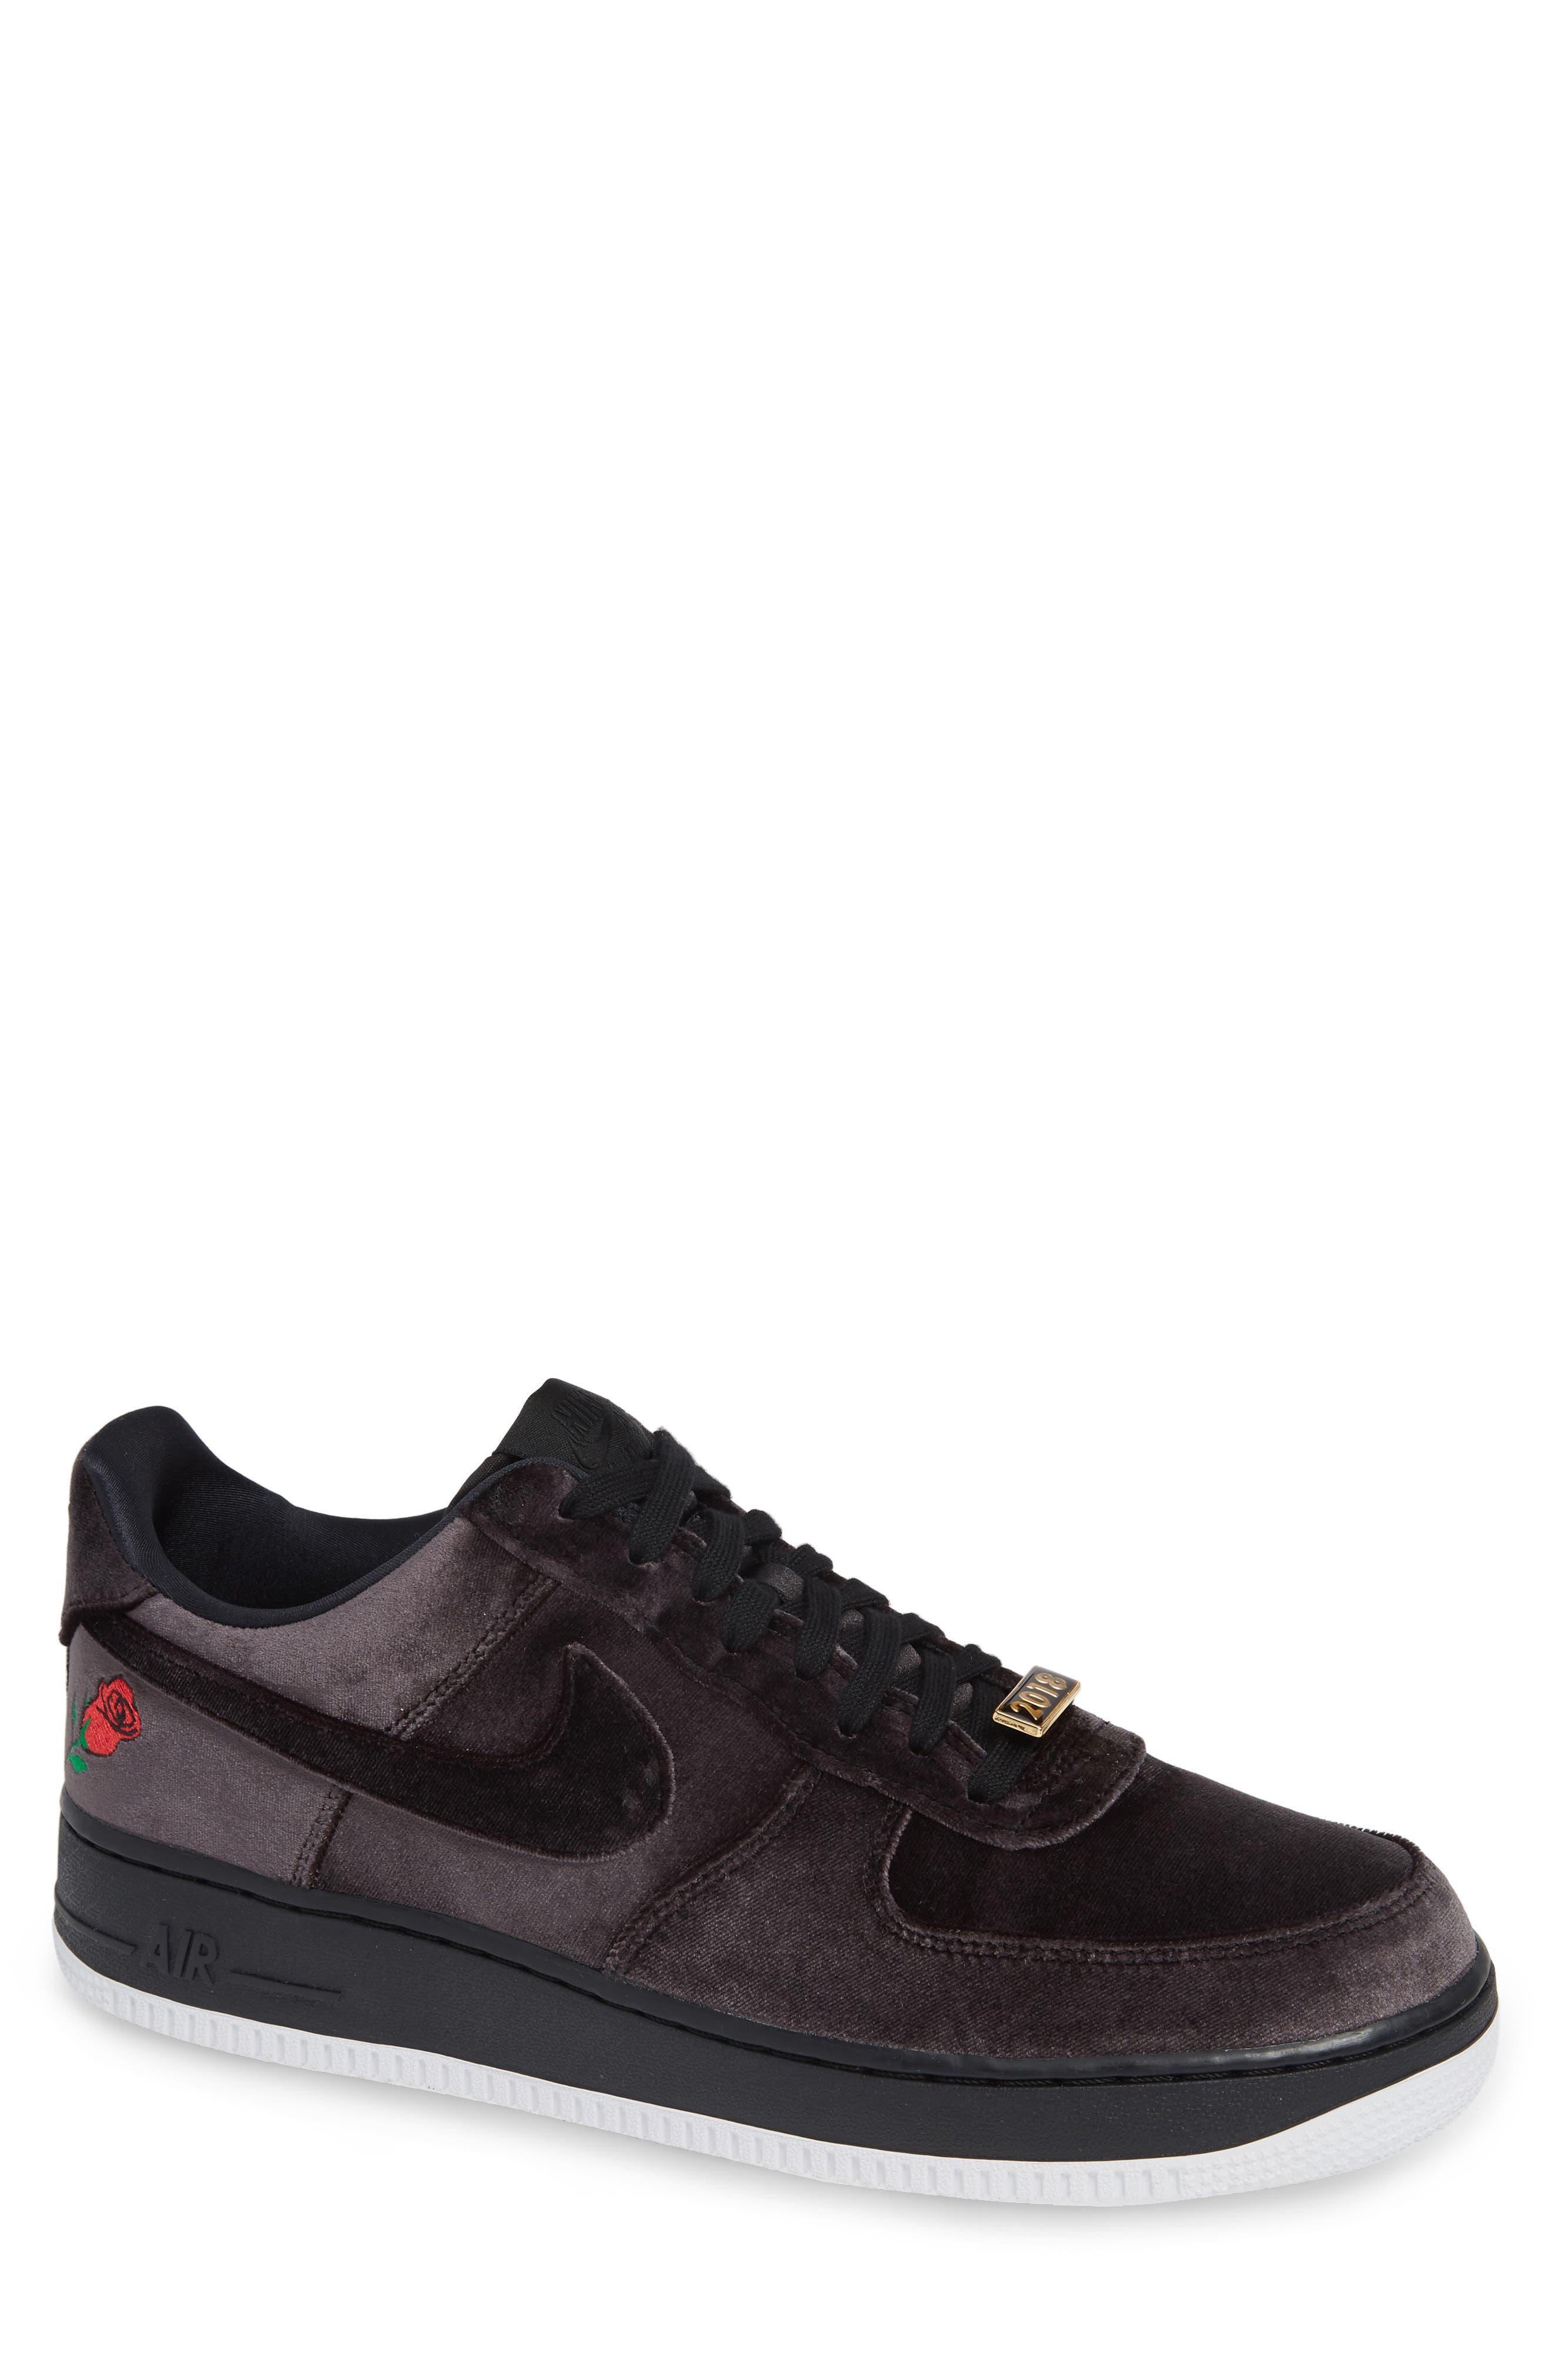 reputable site ce26c 2c61d Nike Air Force 1  07 Qs Sneaker   8 Men s- Black